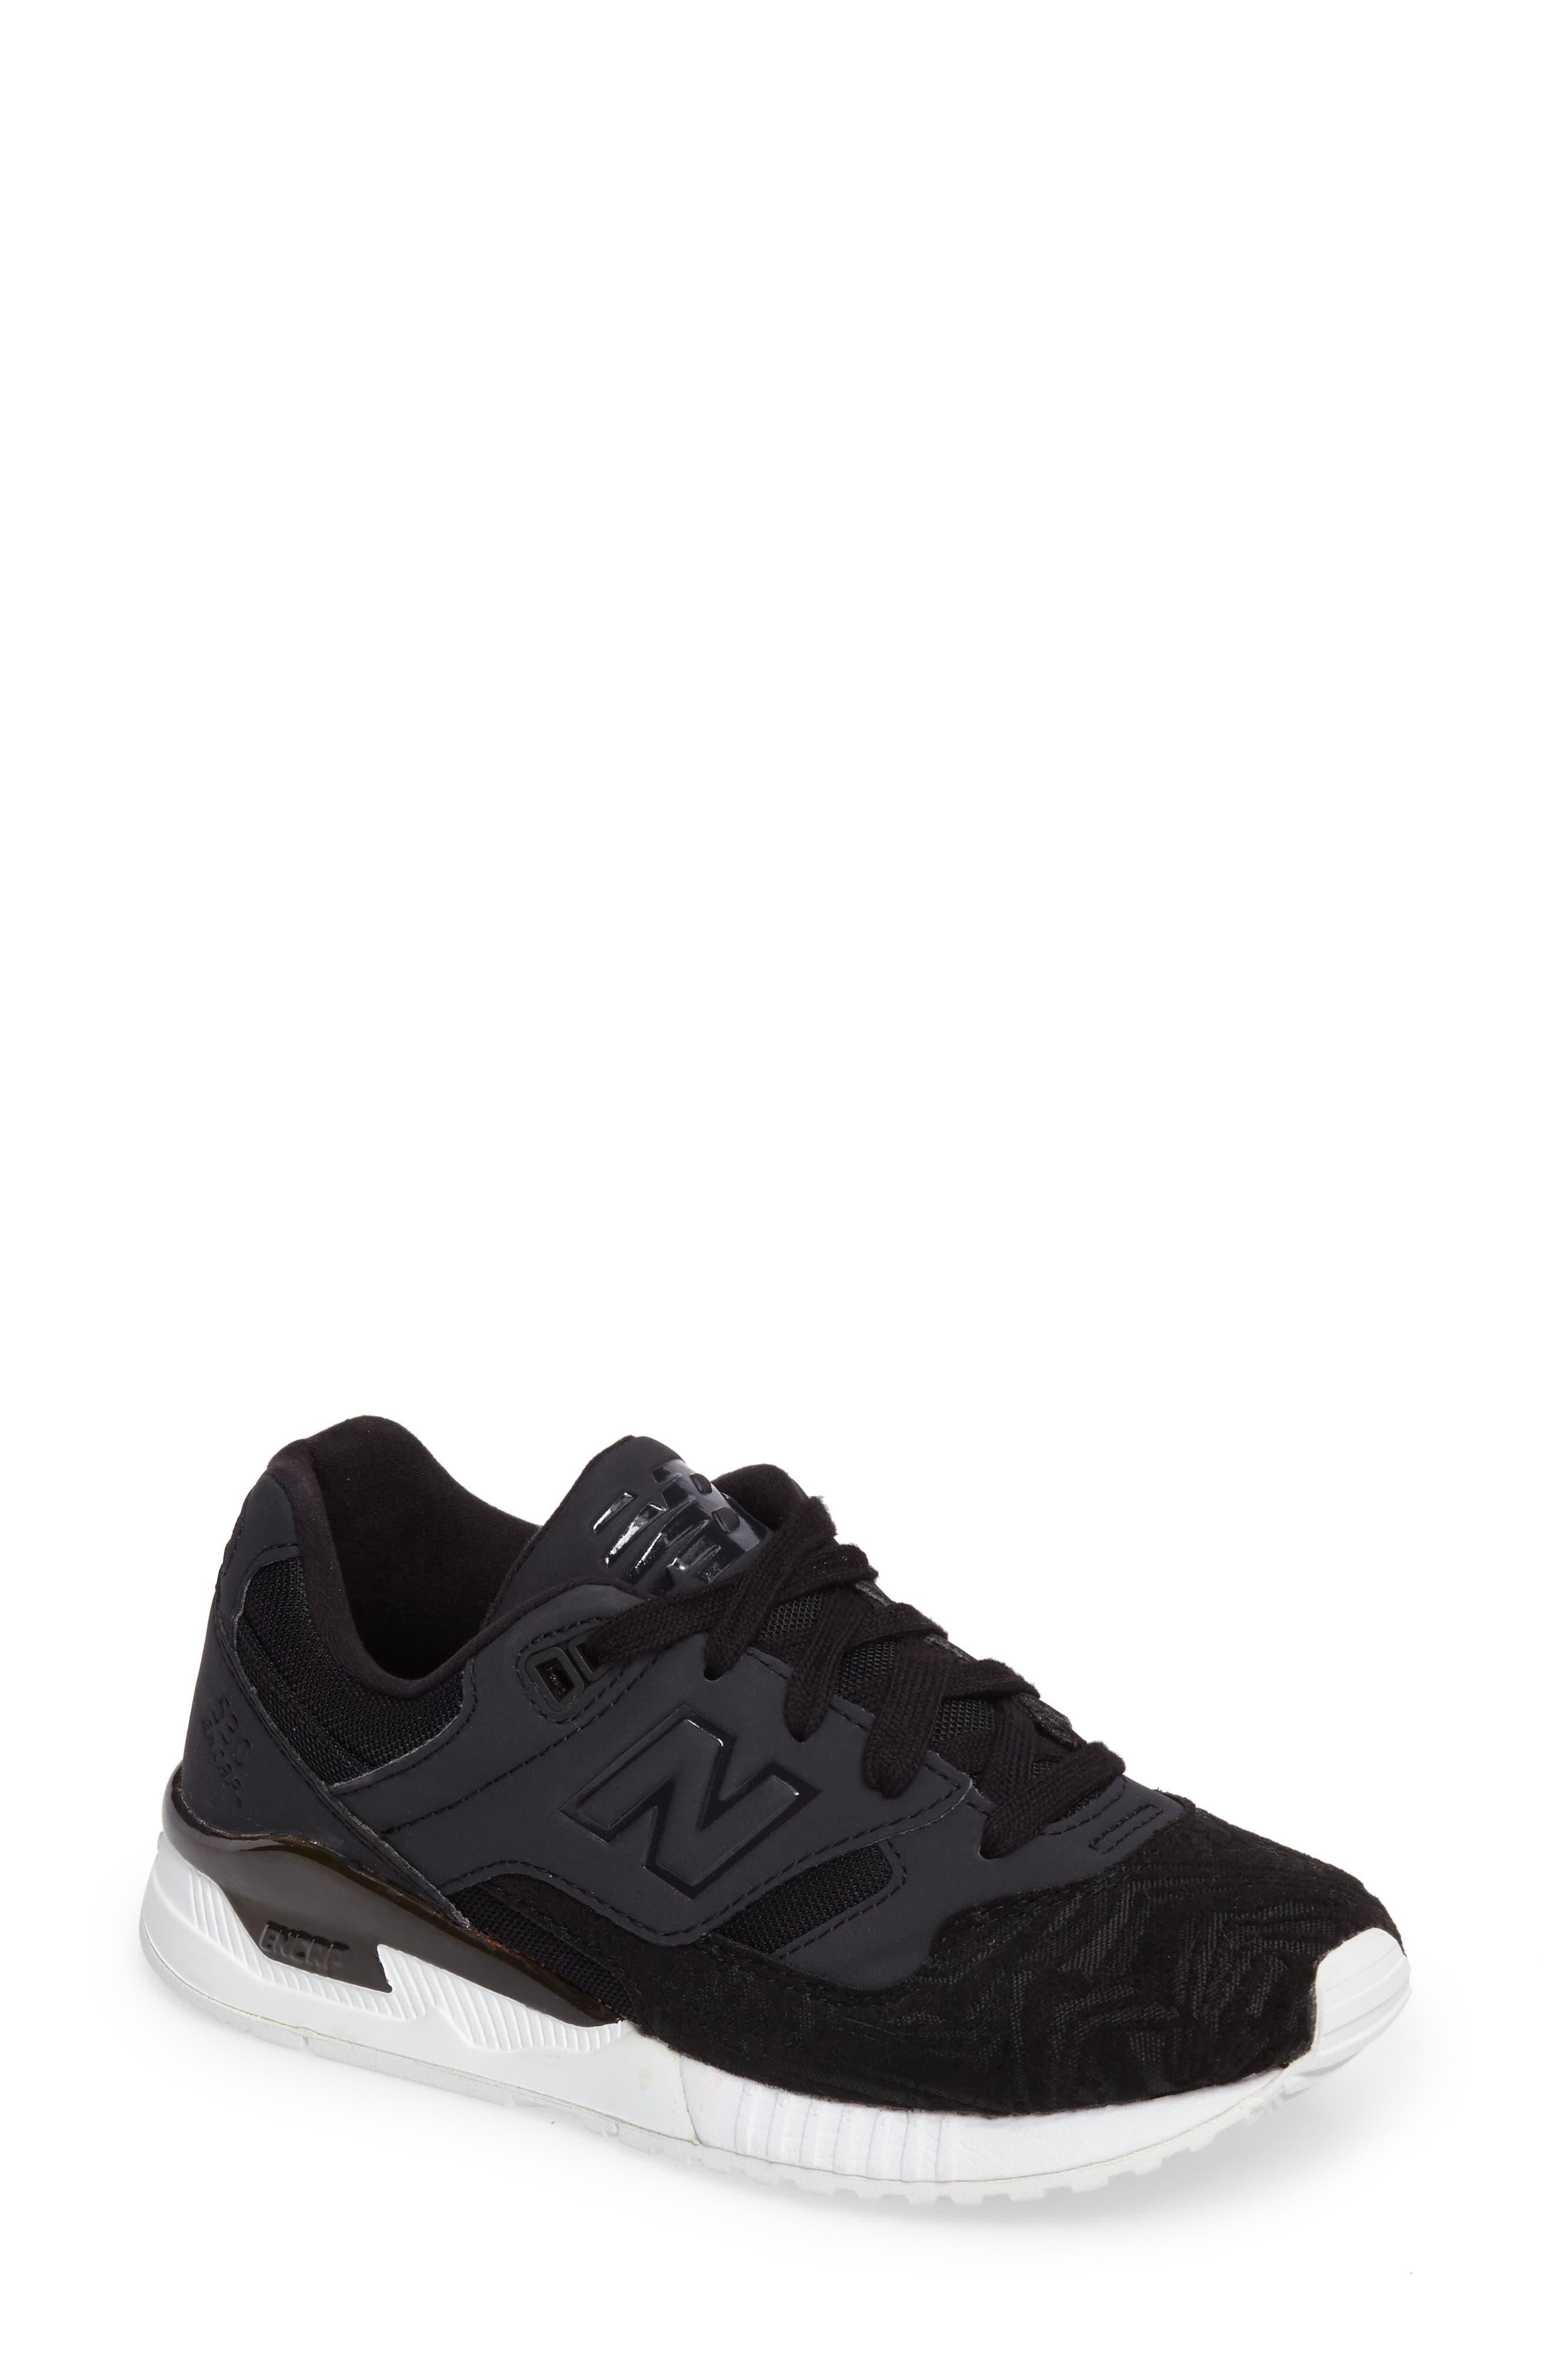 '530' Sneaker,                             Main thumbnail 1, color,                             001